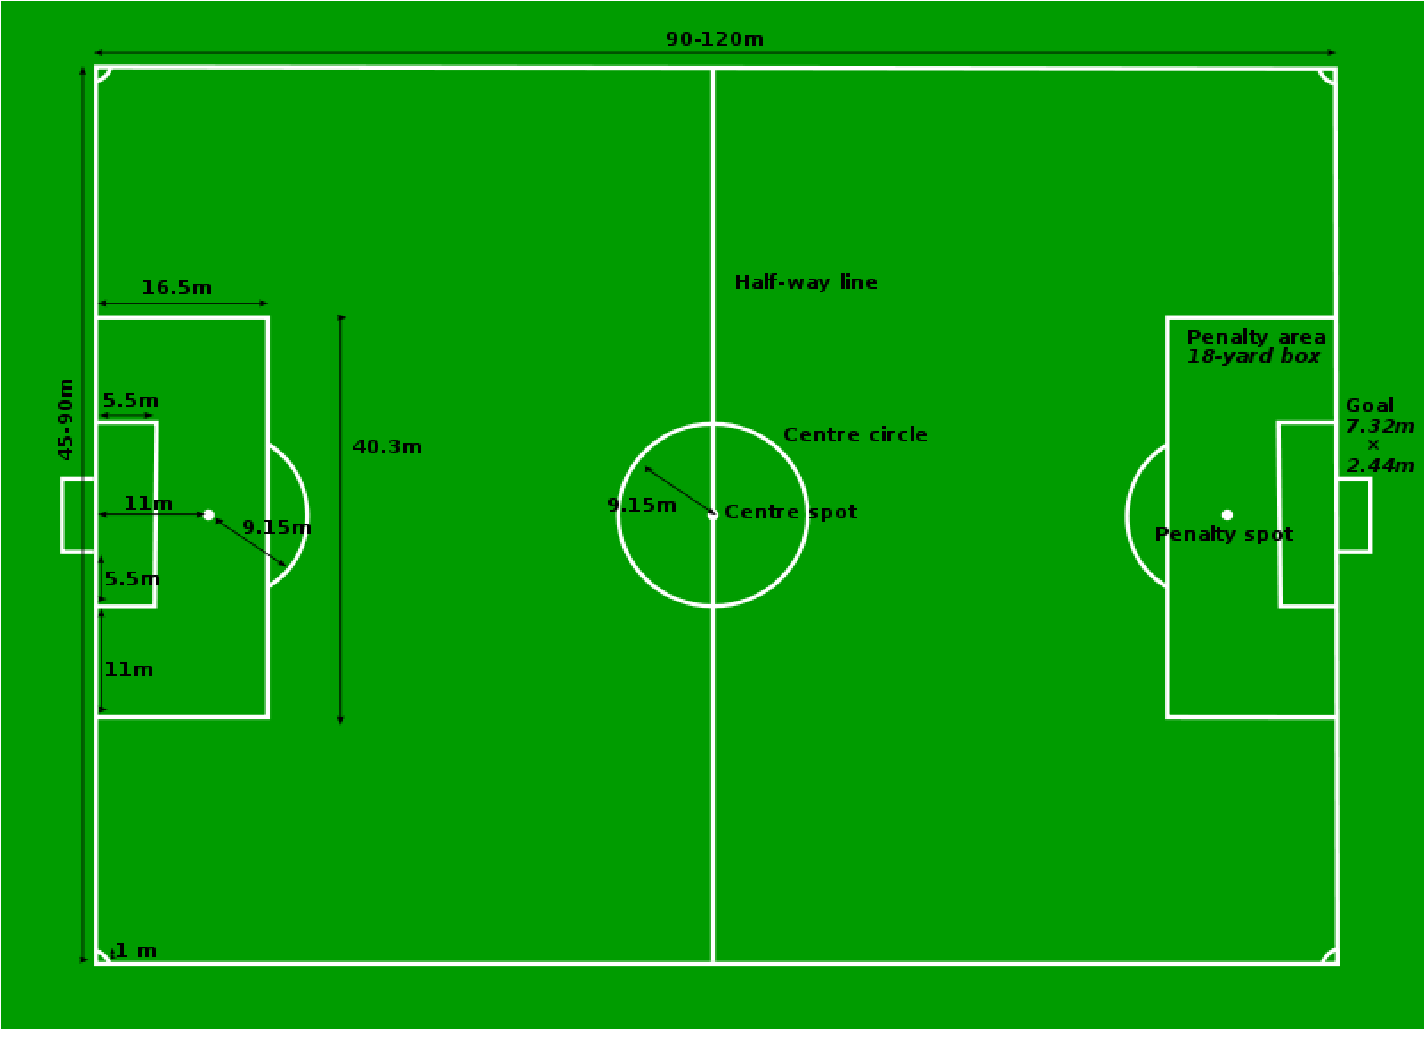 Download Kumpulan Gambar Sketsa Lapangan Sepak Bola Beserta